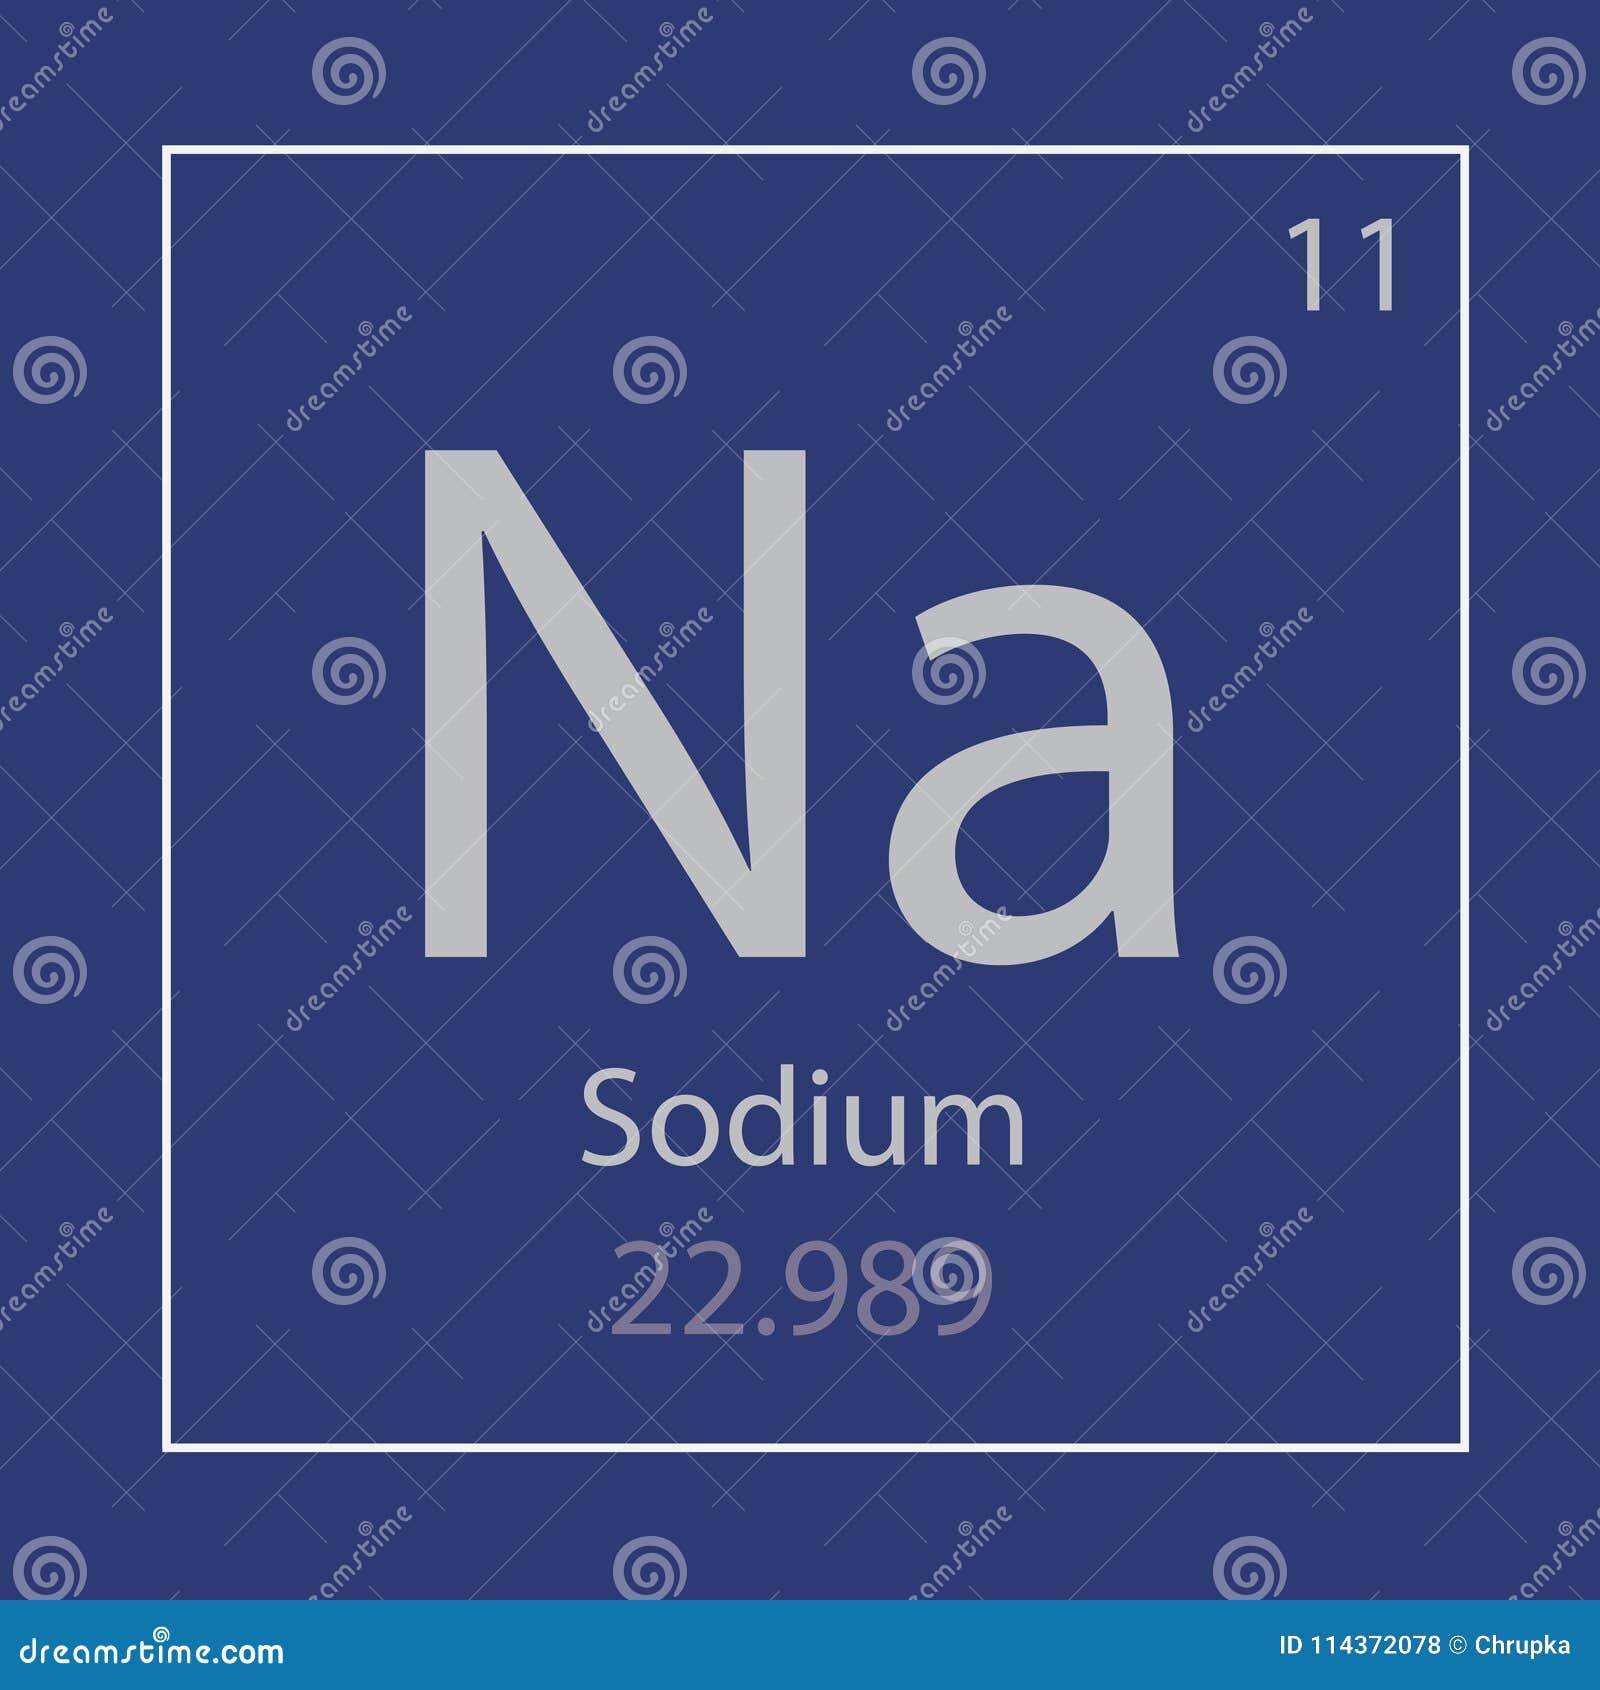 Sodium Na Chemical Element Icon Stock Vector Illustration Of